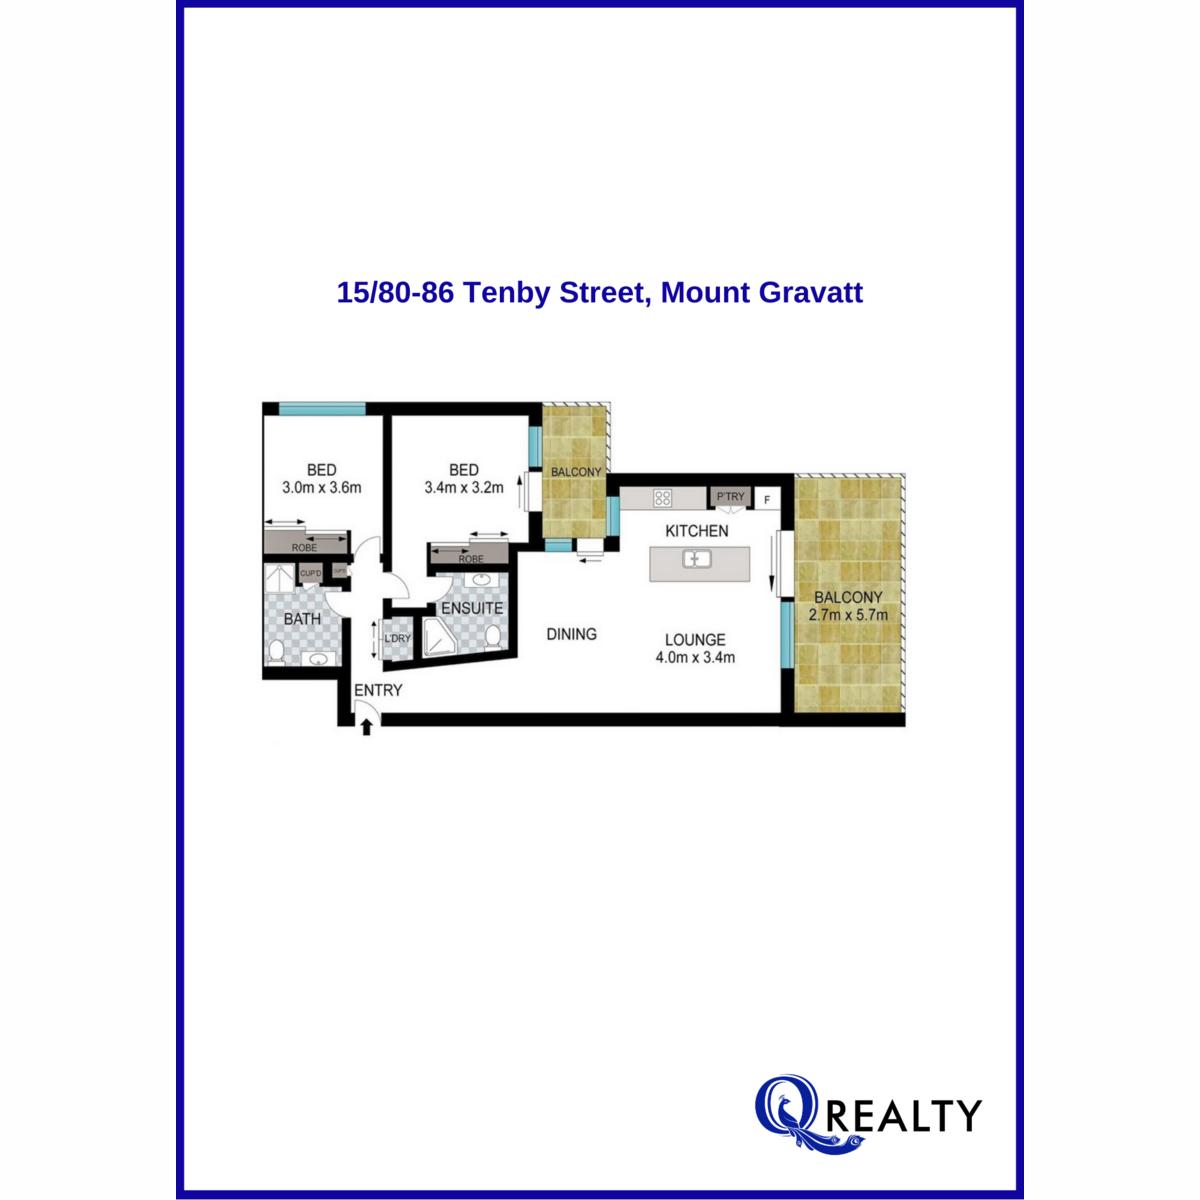 15/80-86 Tenby Street, Mount Gravatt  QLD  4122